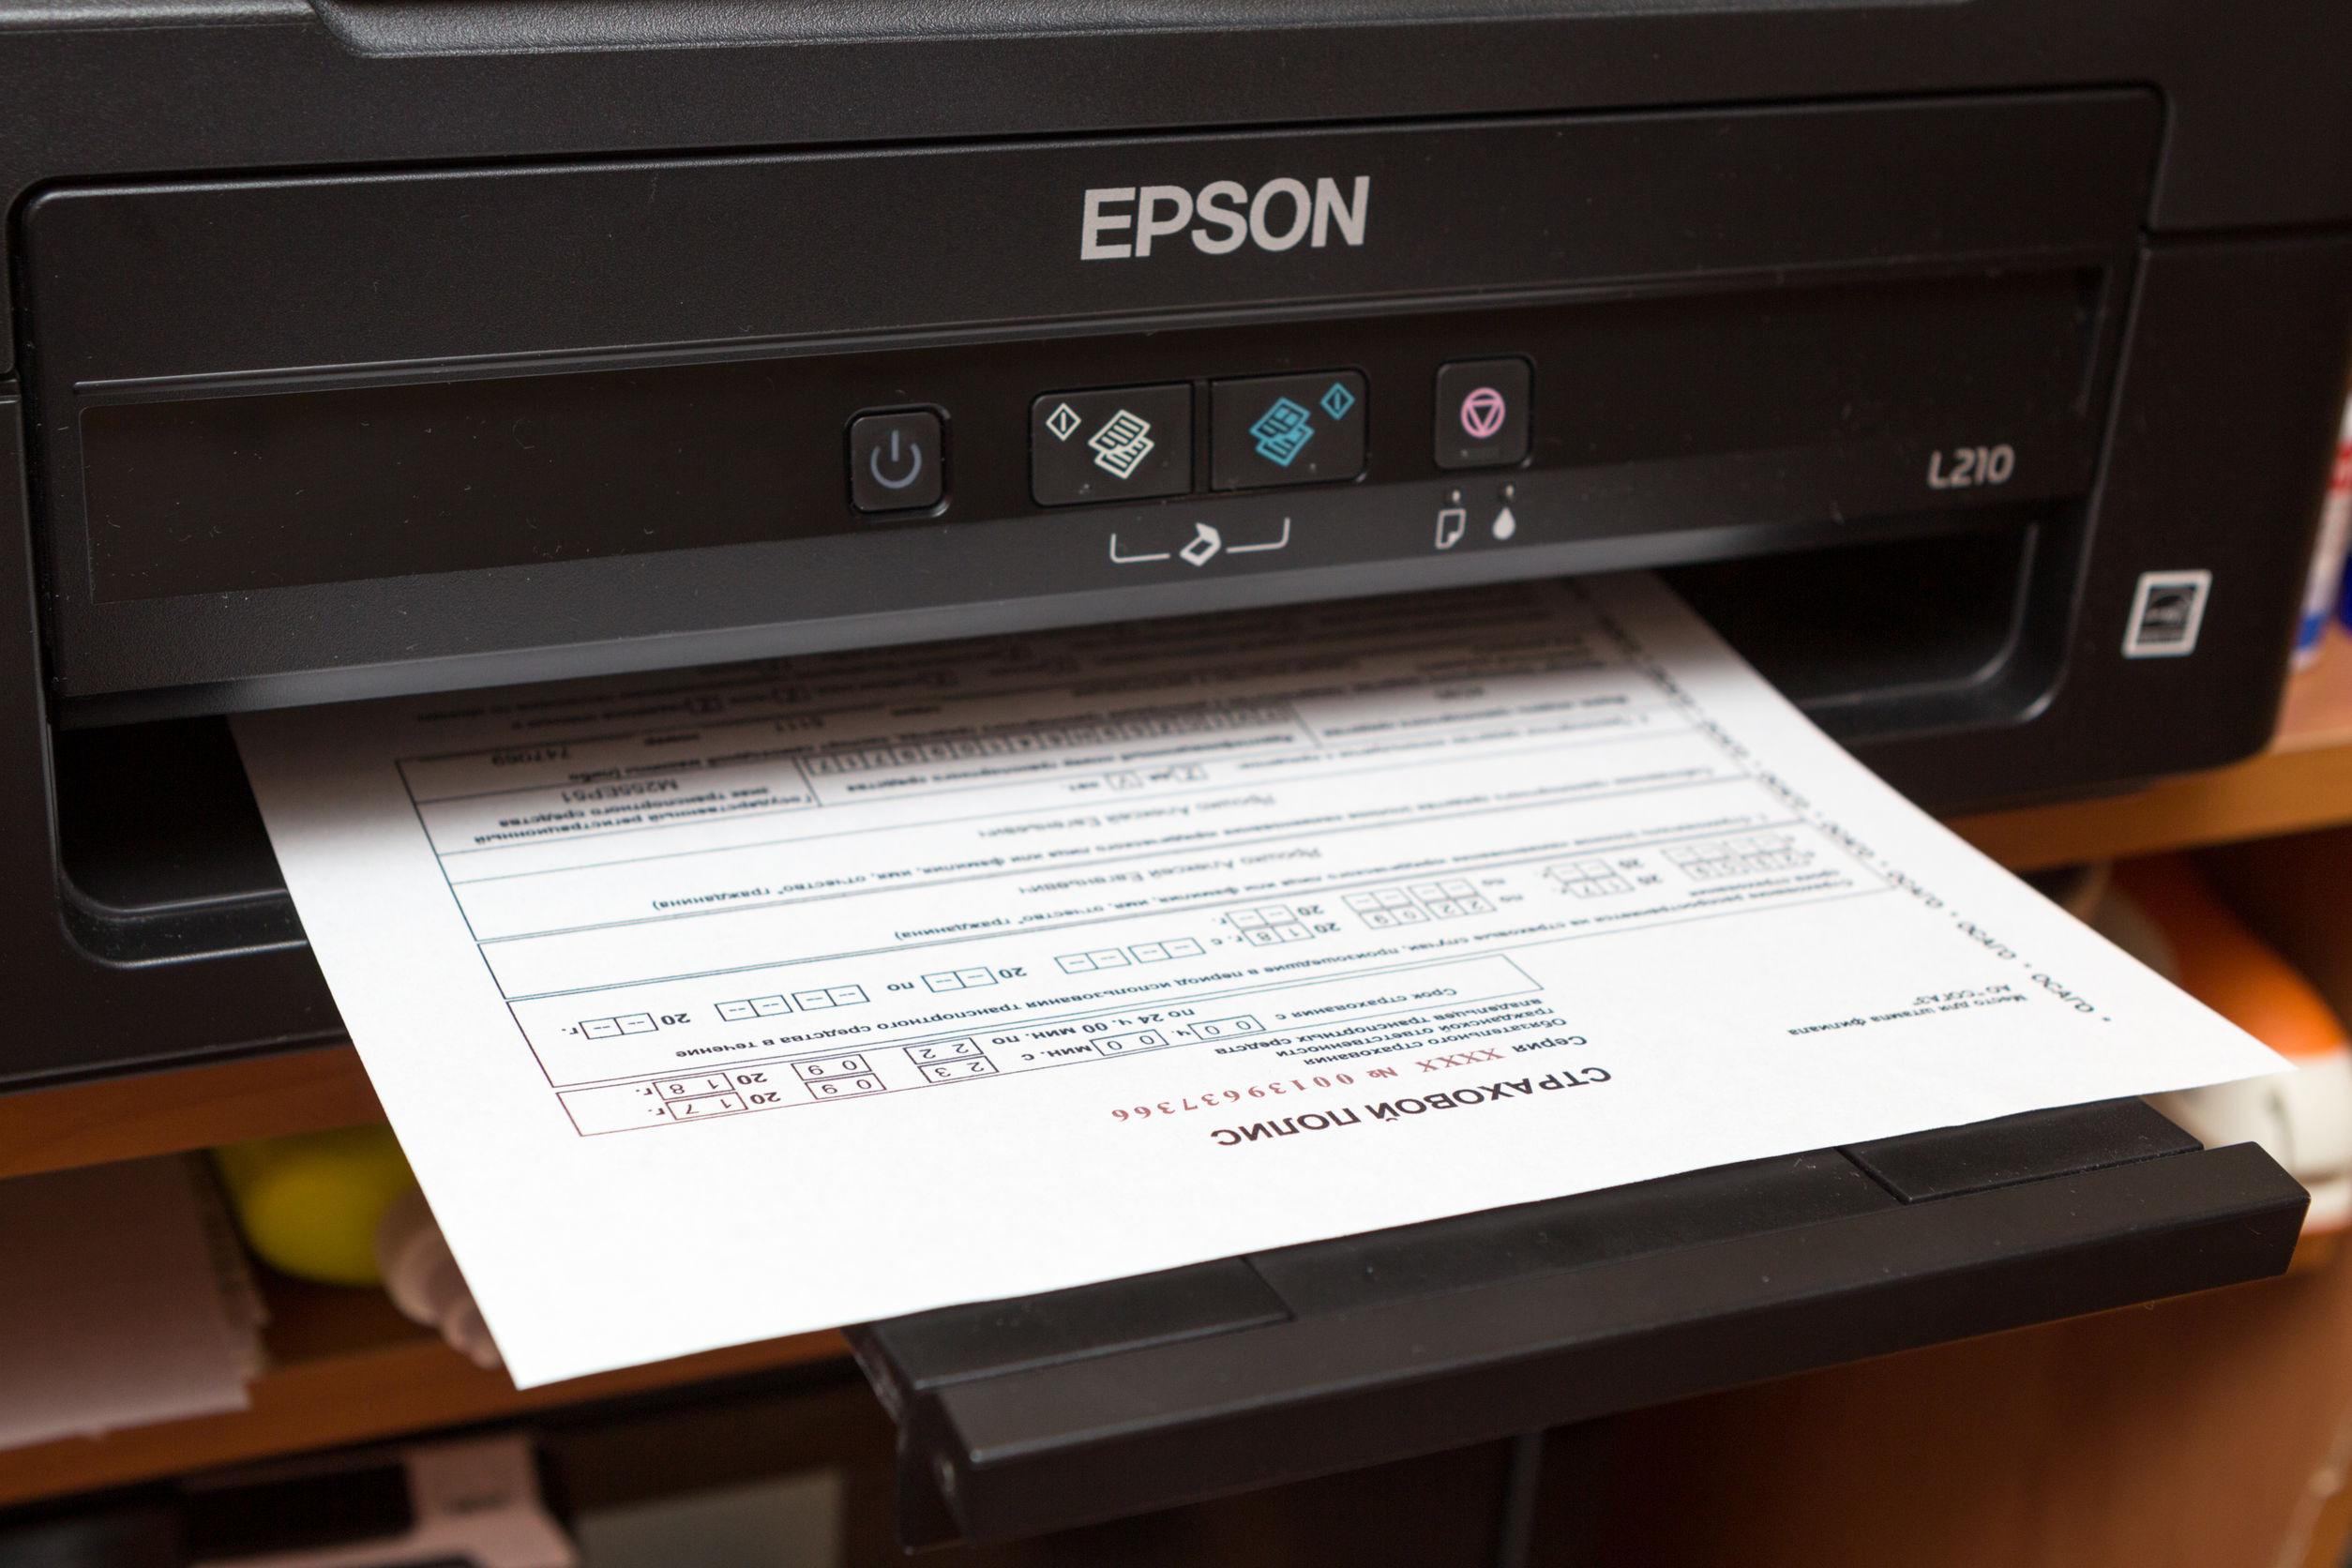 impresora epson imprimiendo